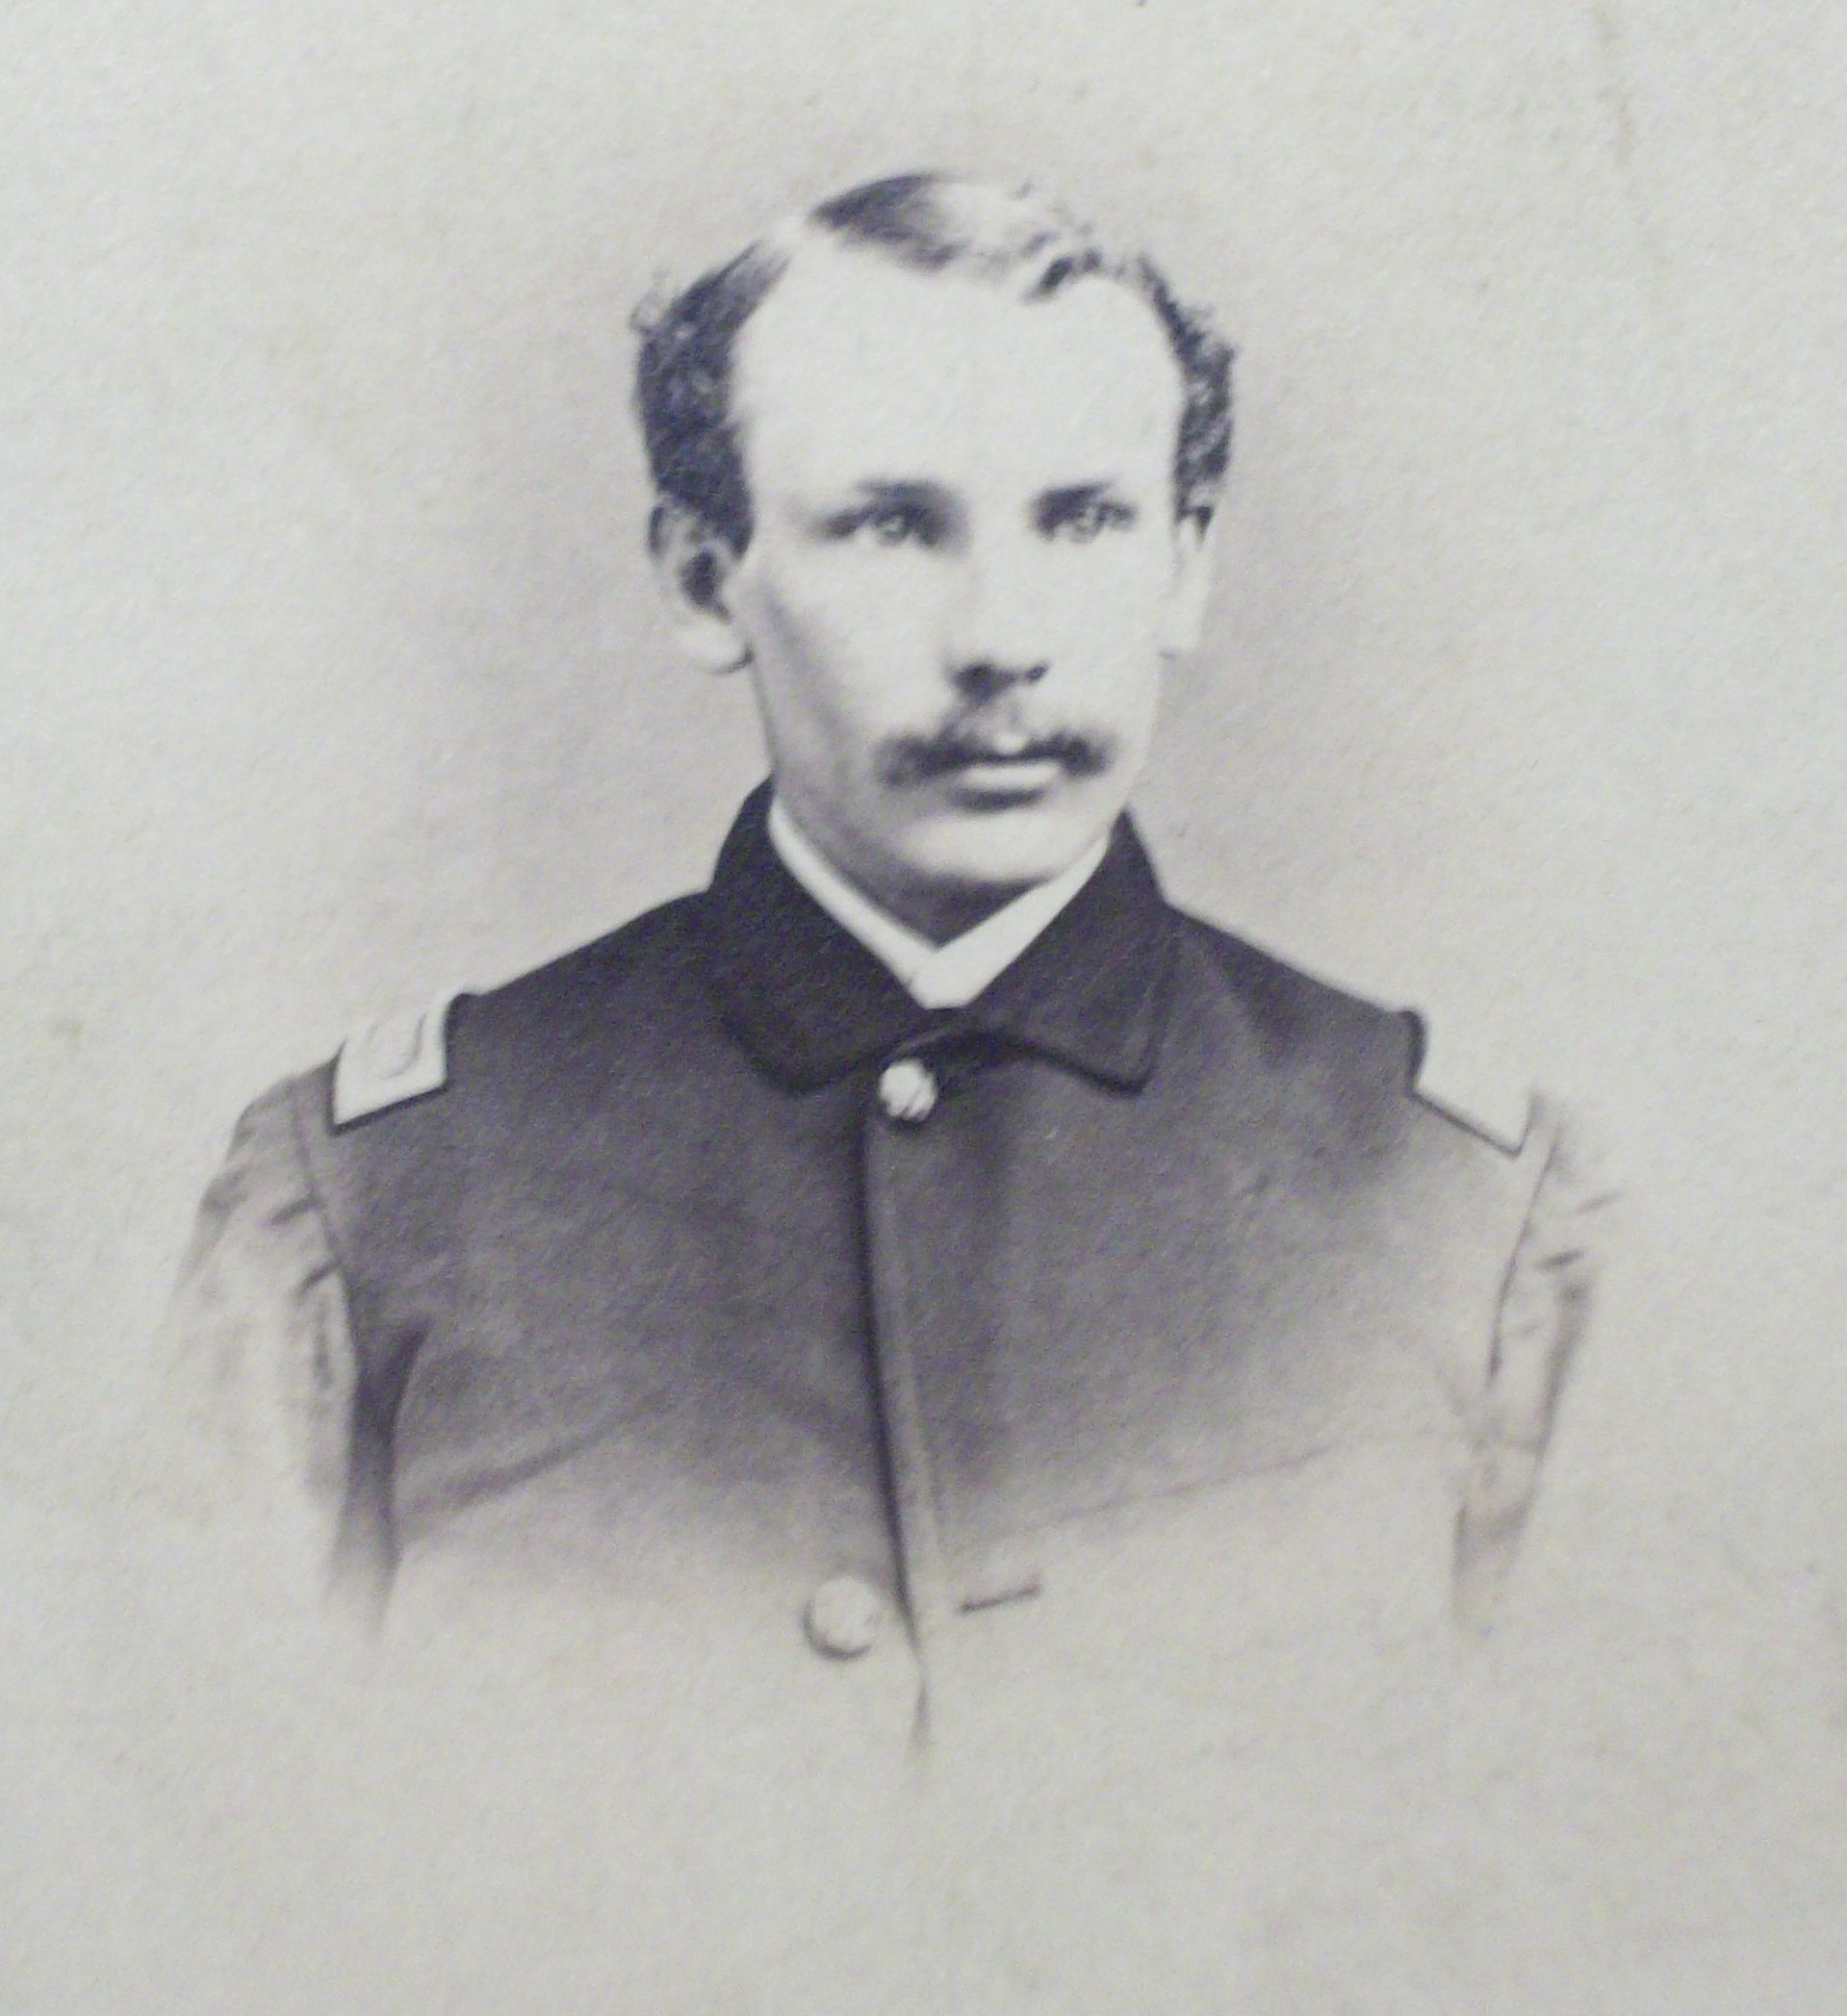 Dudley Olcott